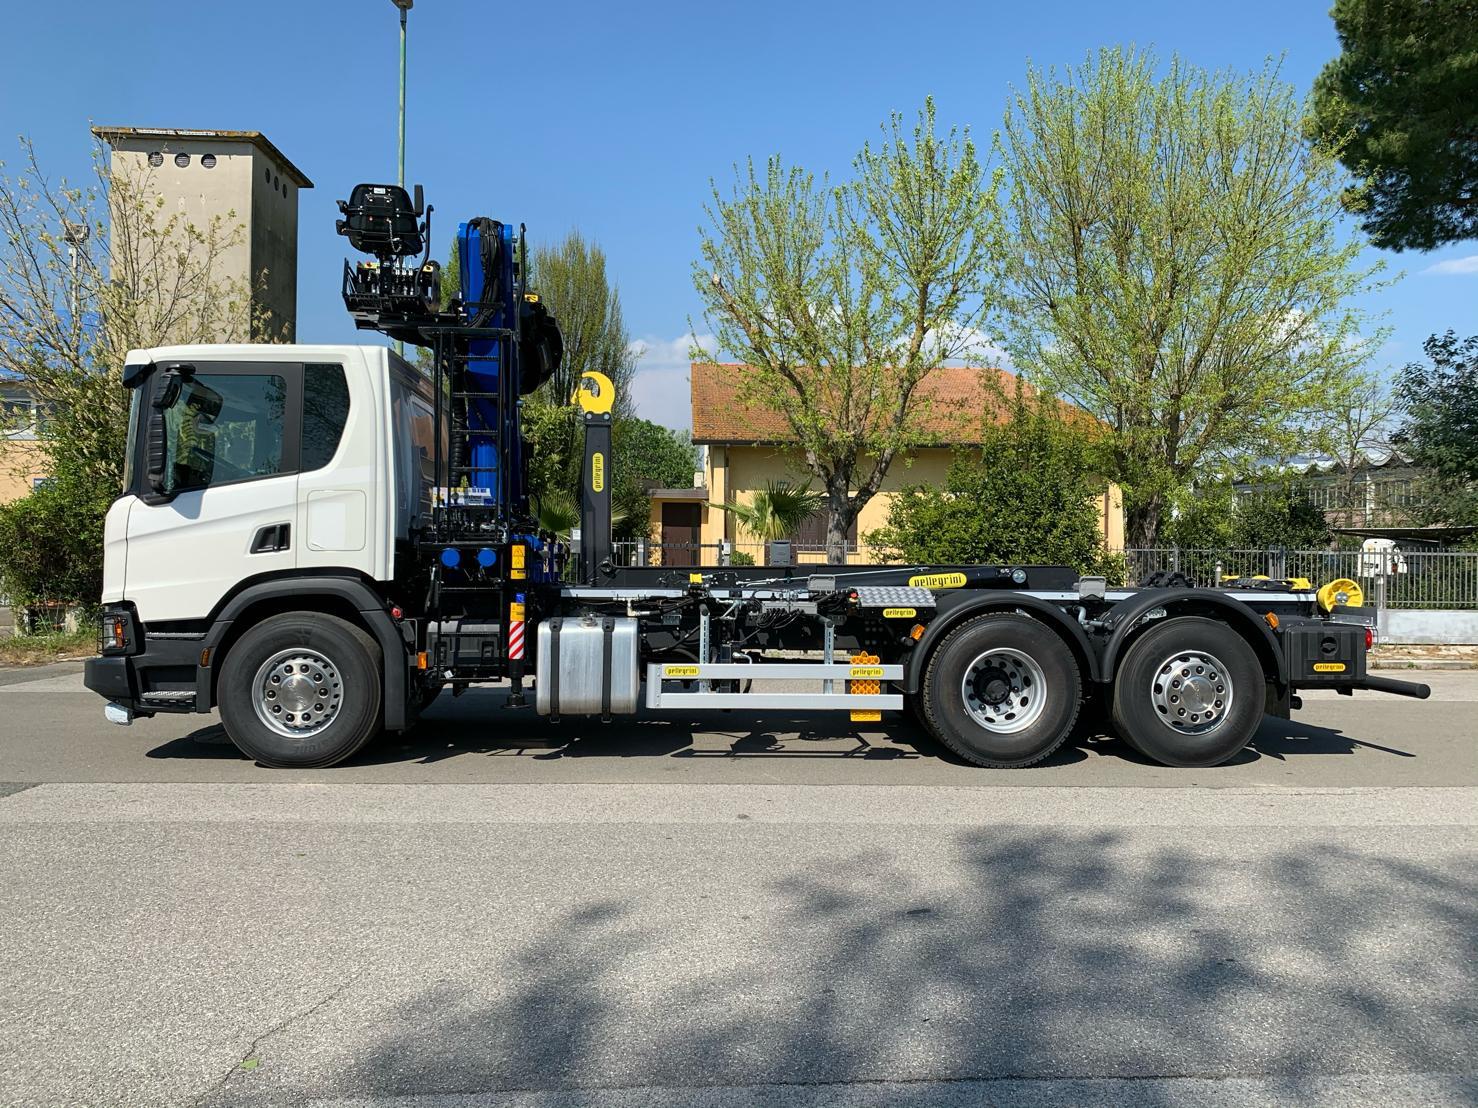 gru per camion-caricatore per camion-allestimento per camion-caricatore ecologia e rottami- marchesigru-pellegrini alestimenti